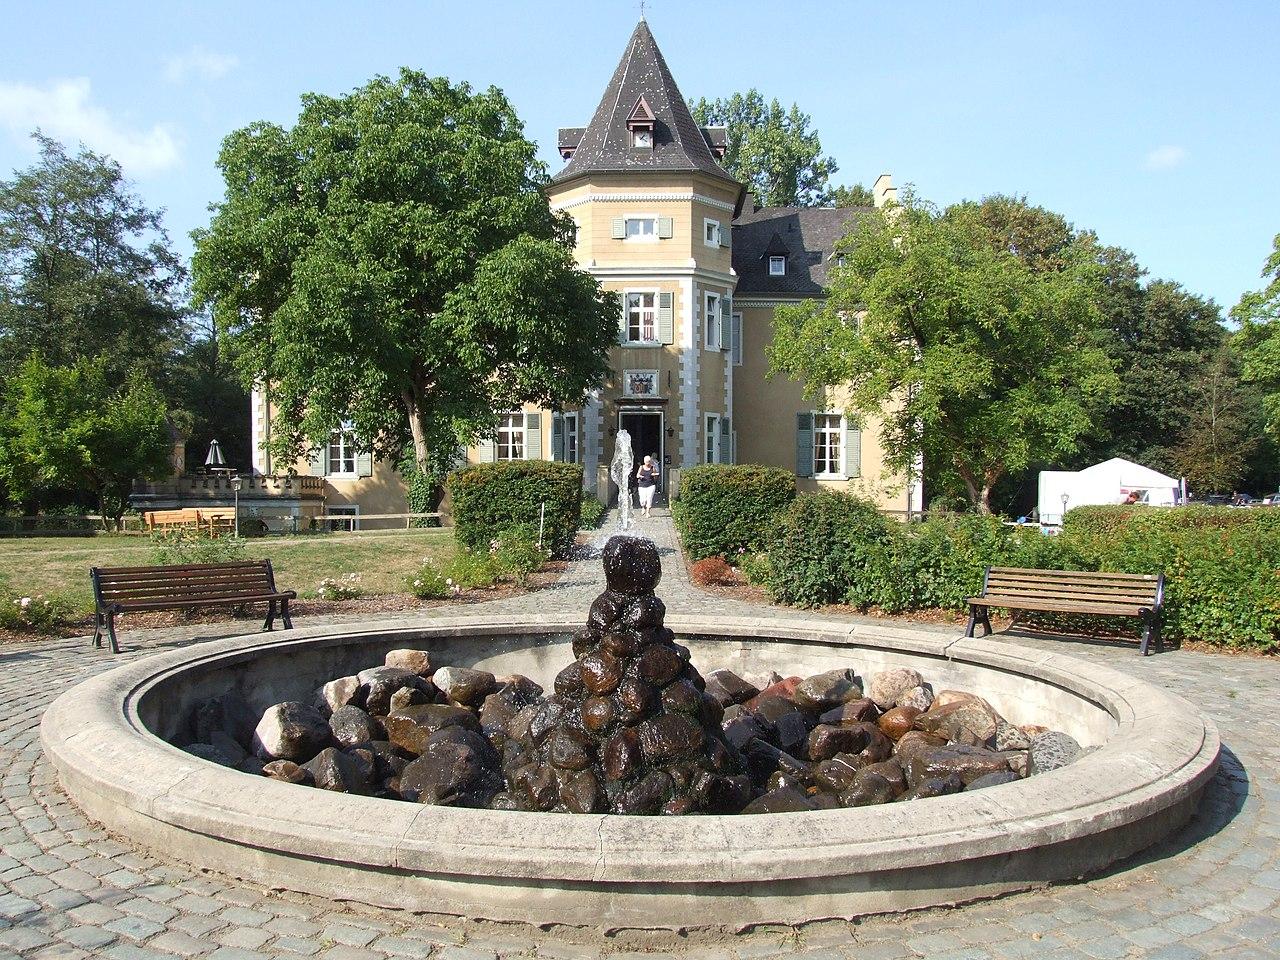 Filedenkmalnummer A 0047 B 0020 Dortmund Wasserschloss Und